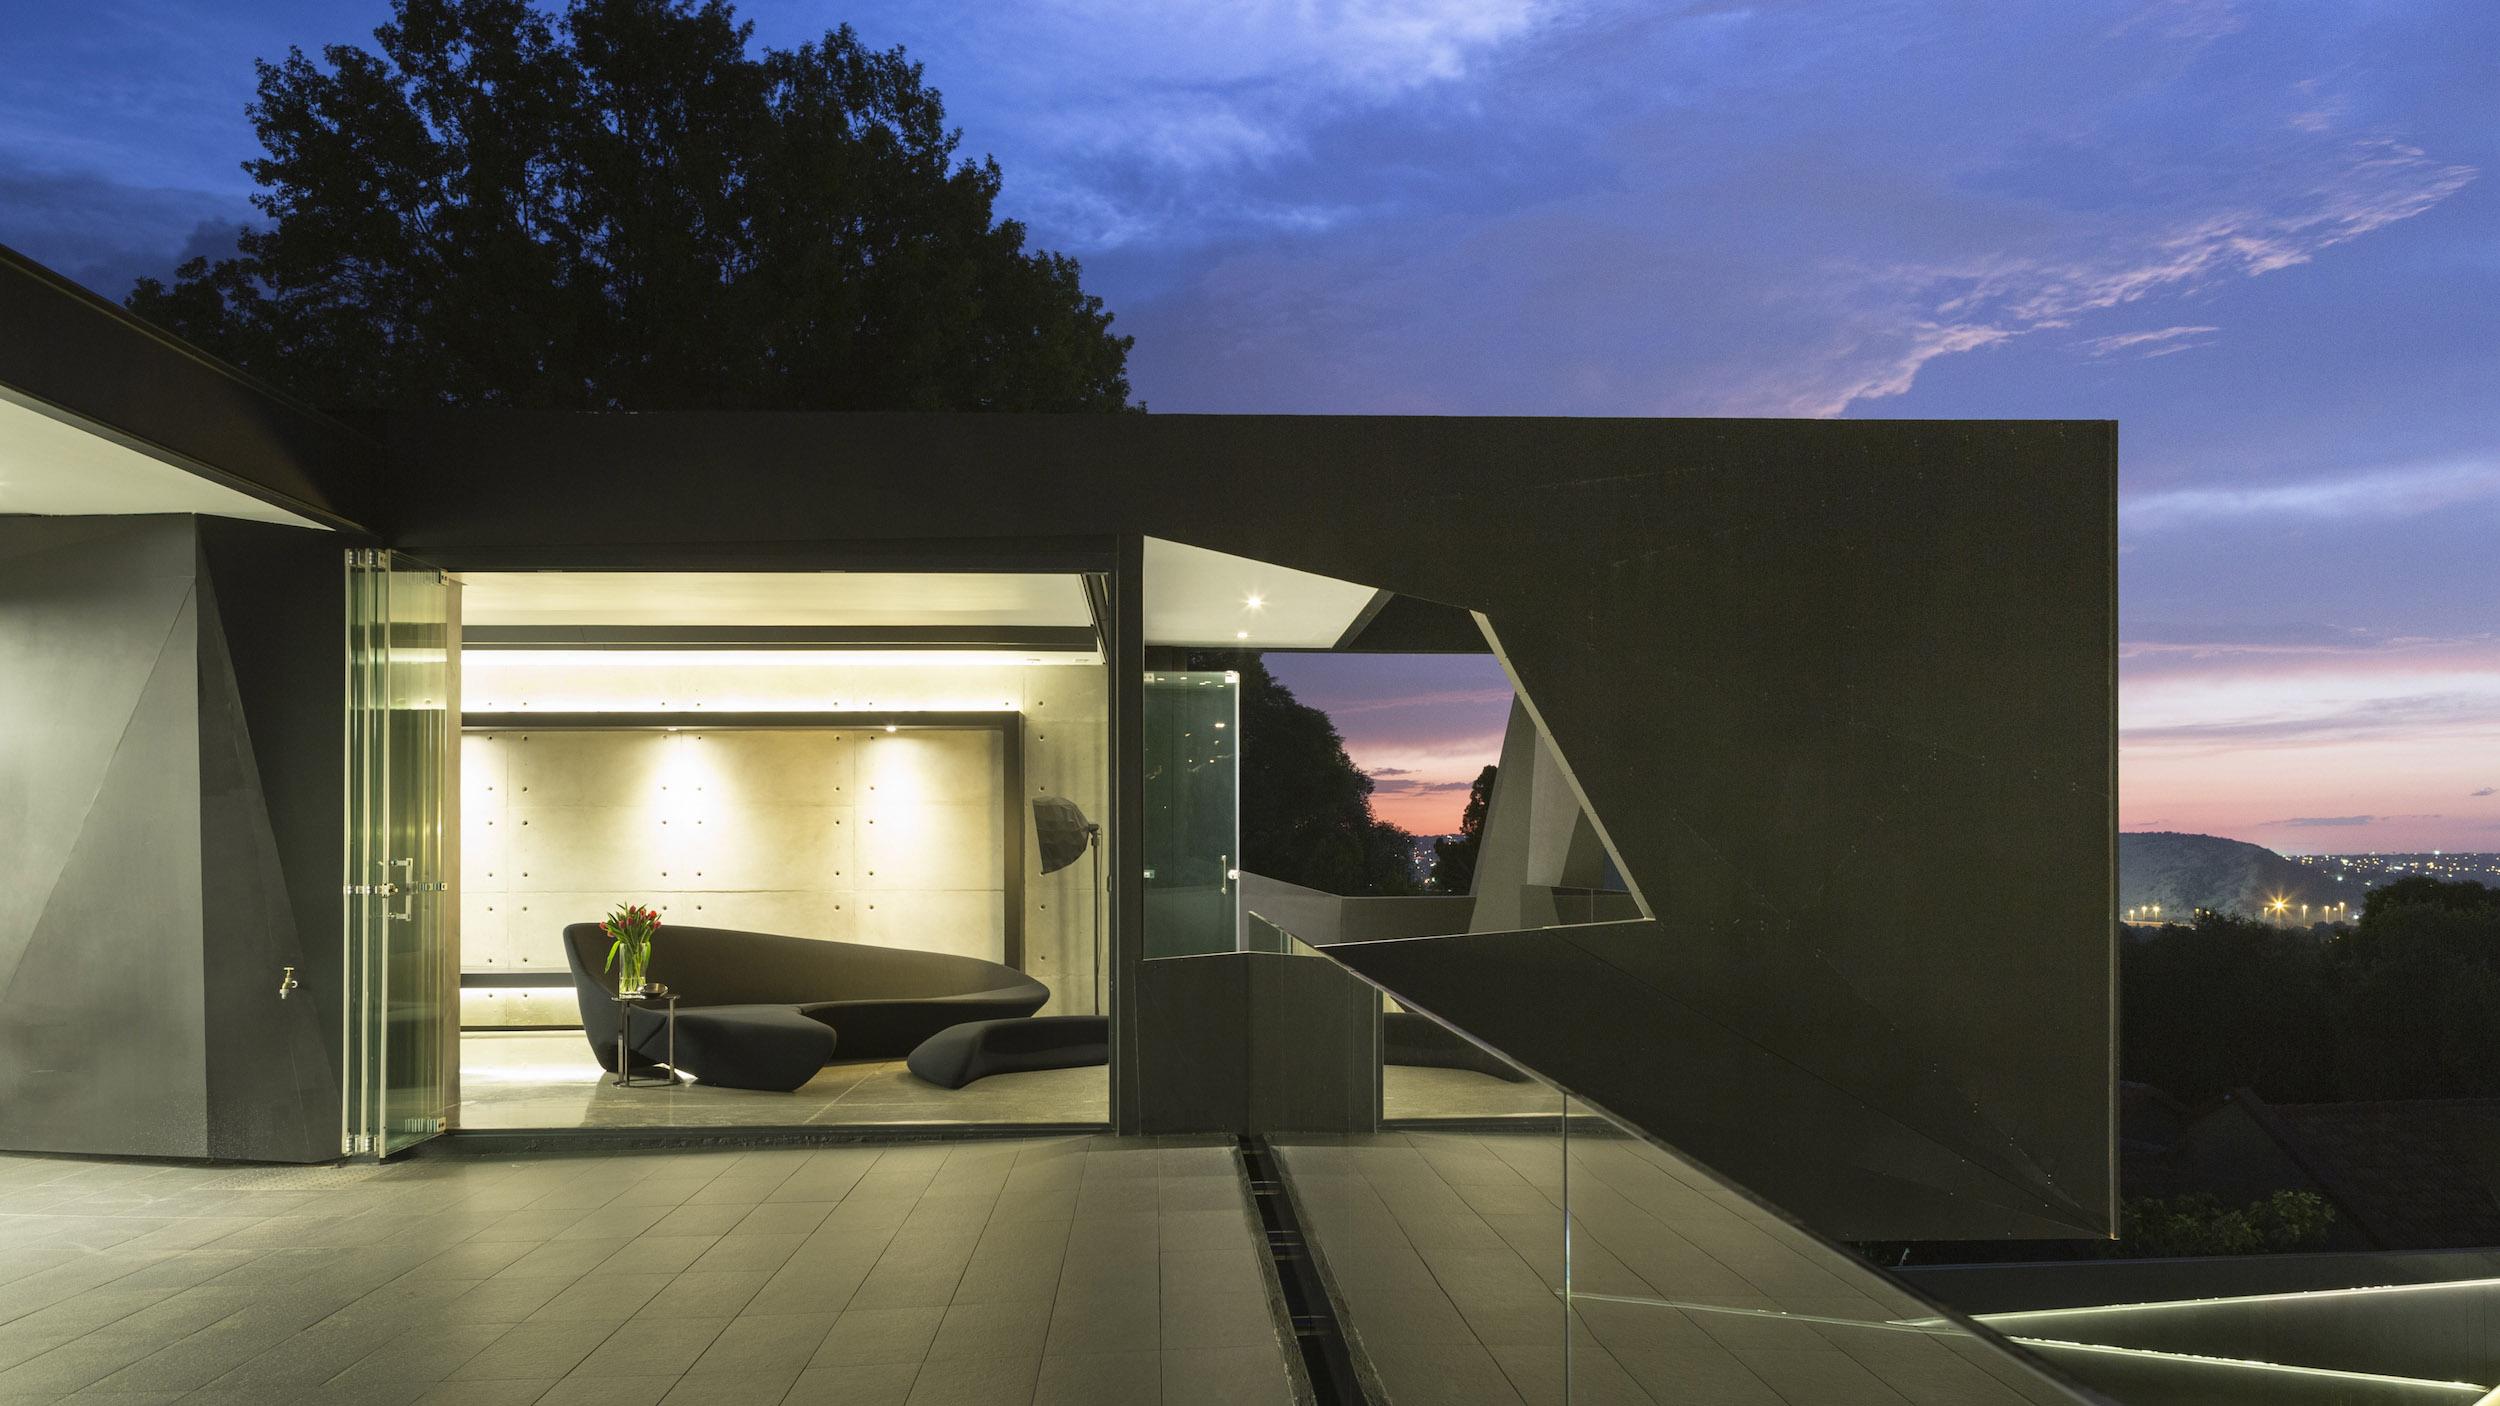 Kloof Road Masterpiece House in Johannesburg by Nico van der Meulen Architects-35